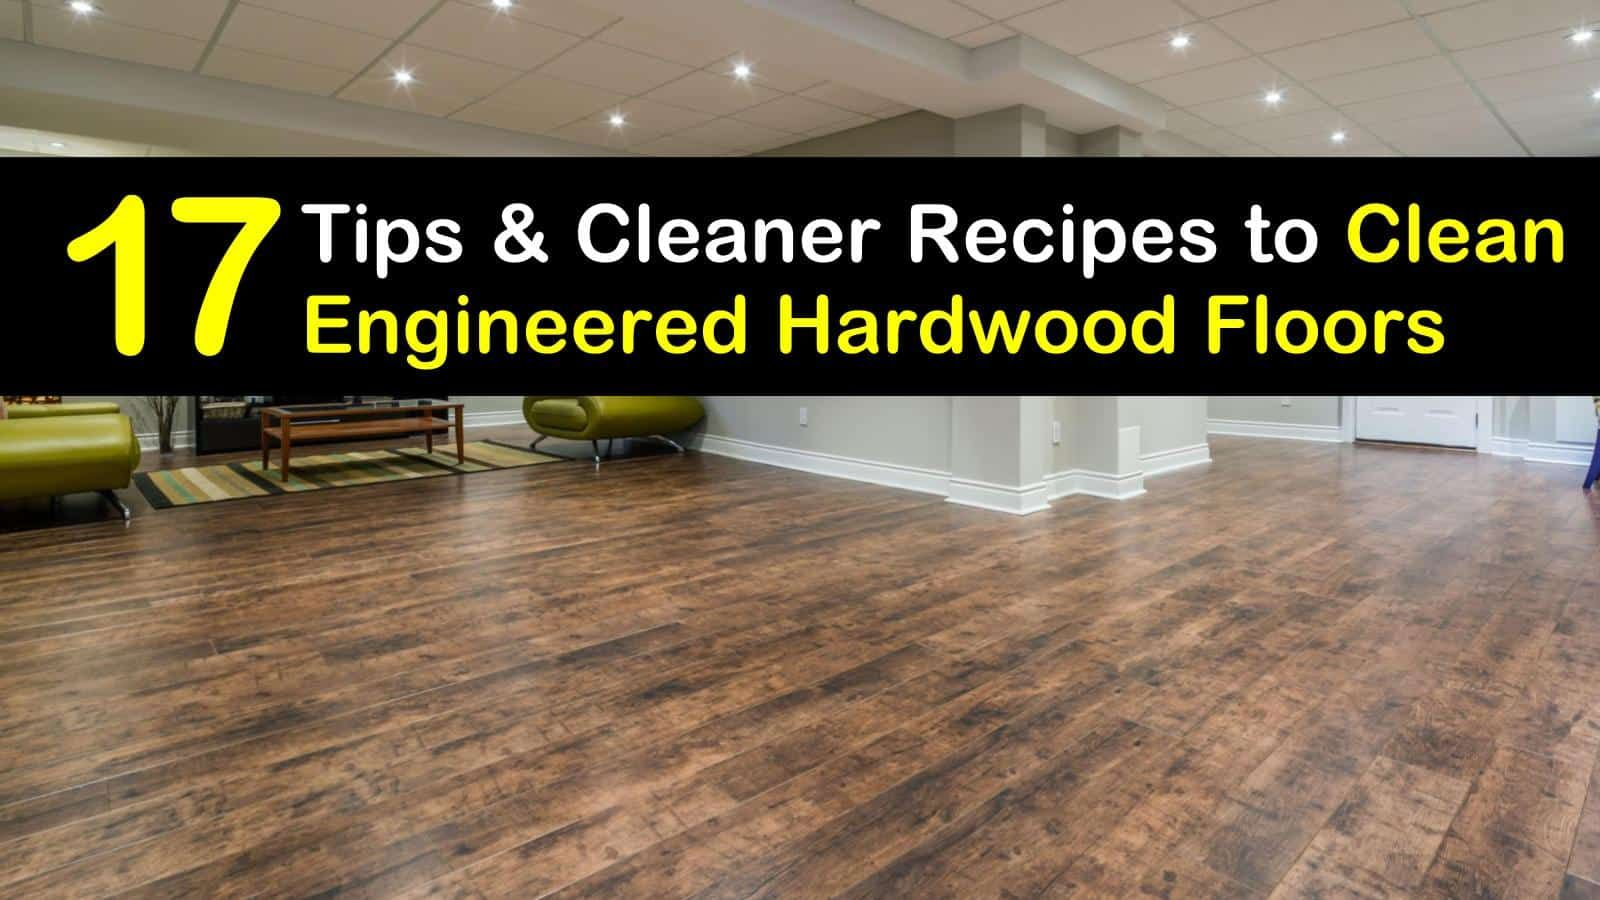 17 Clever Ways to Clean Engineered Hardwood Floors